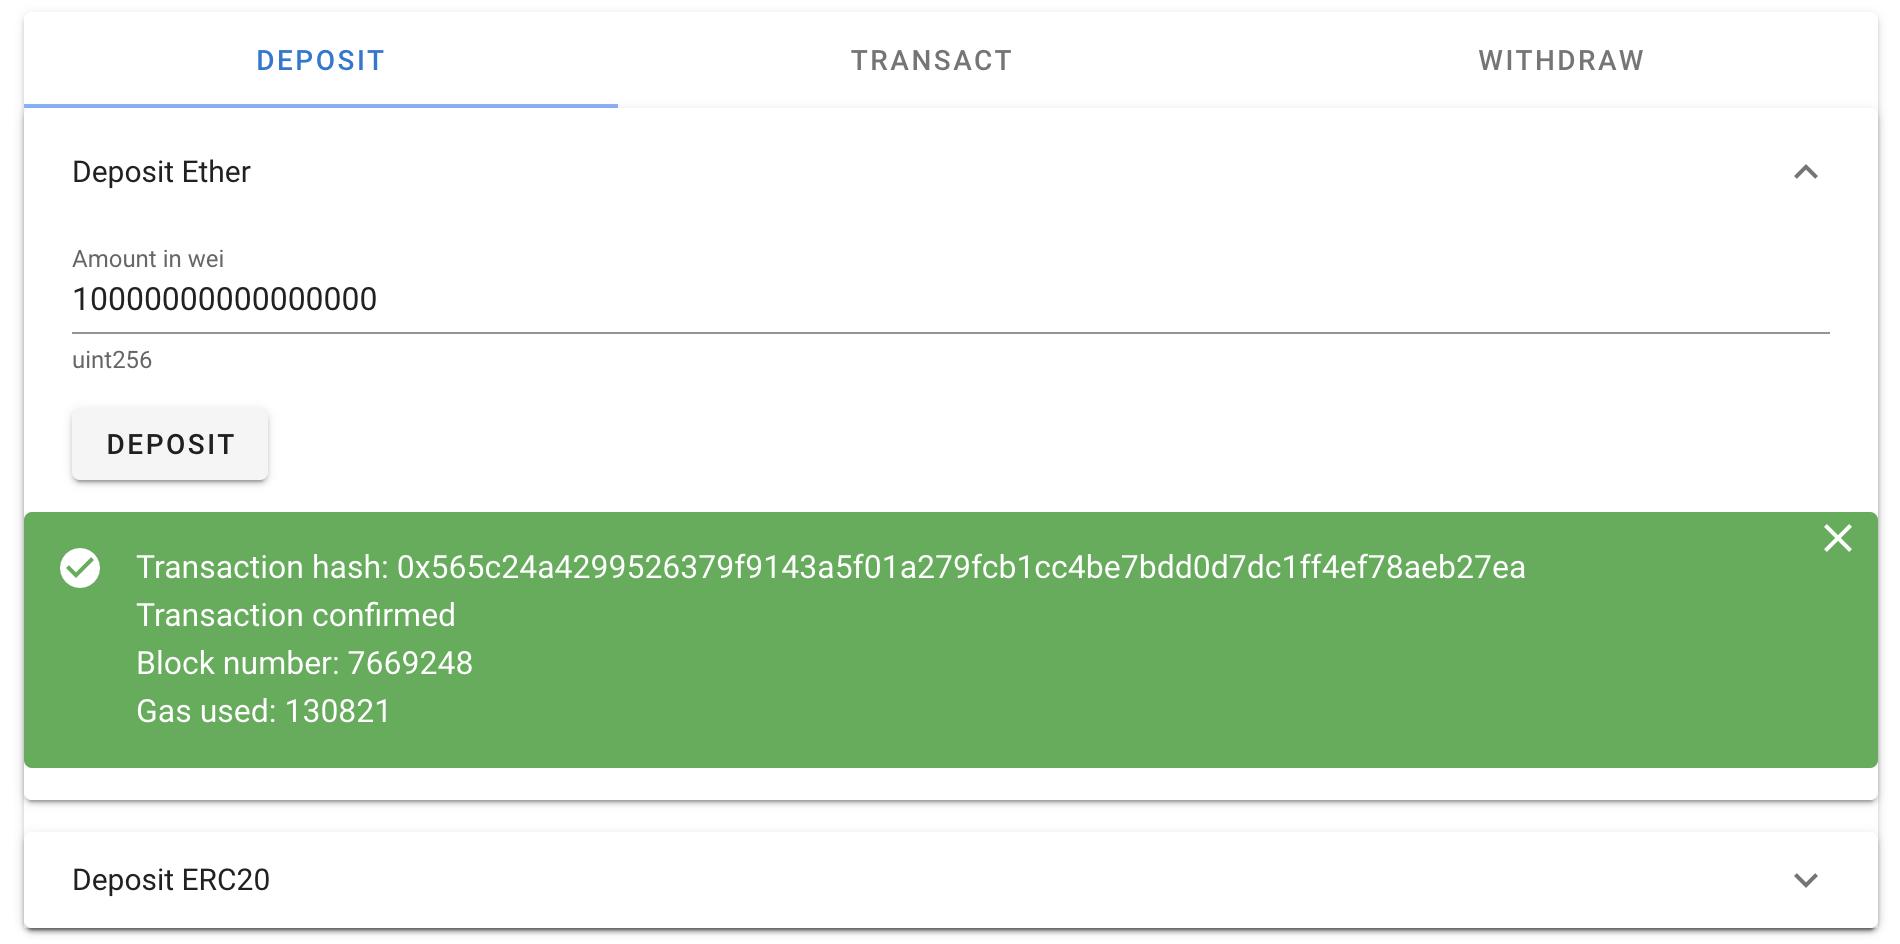 Ether deposit transaction has been confirmed